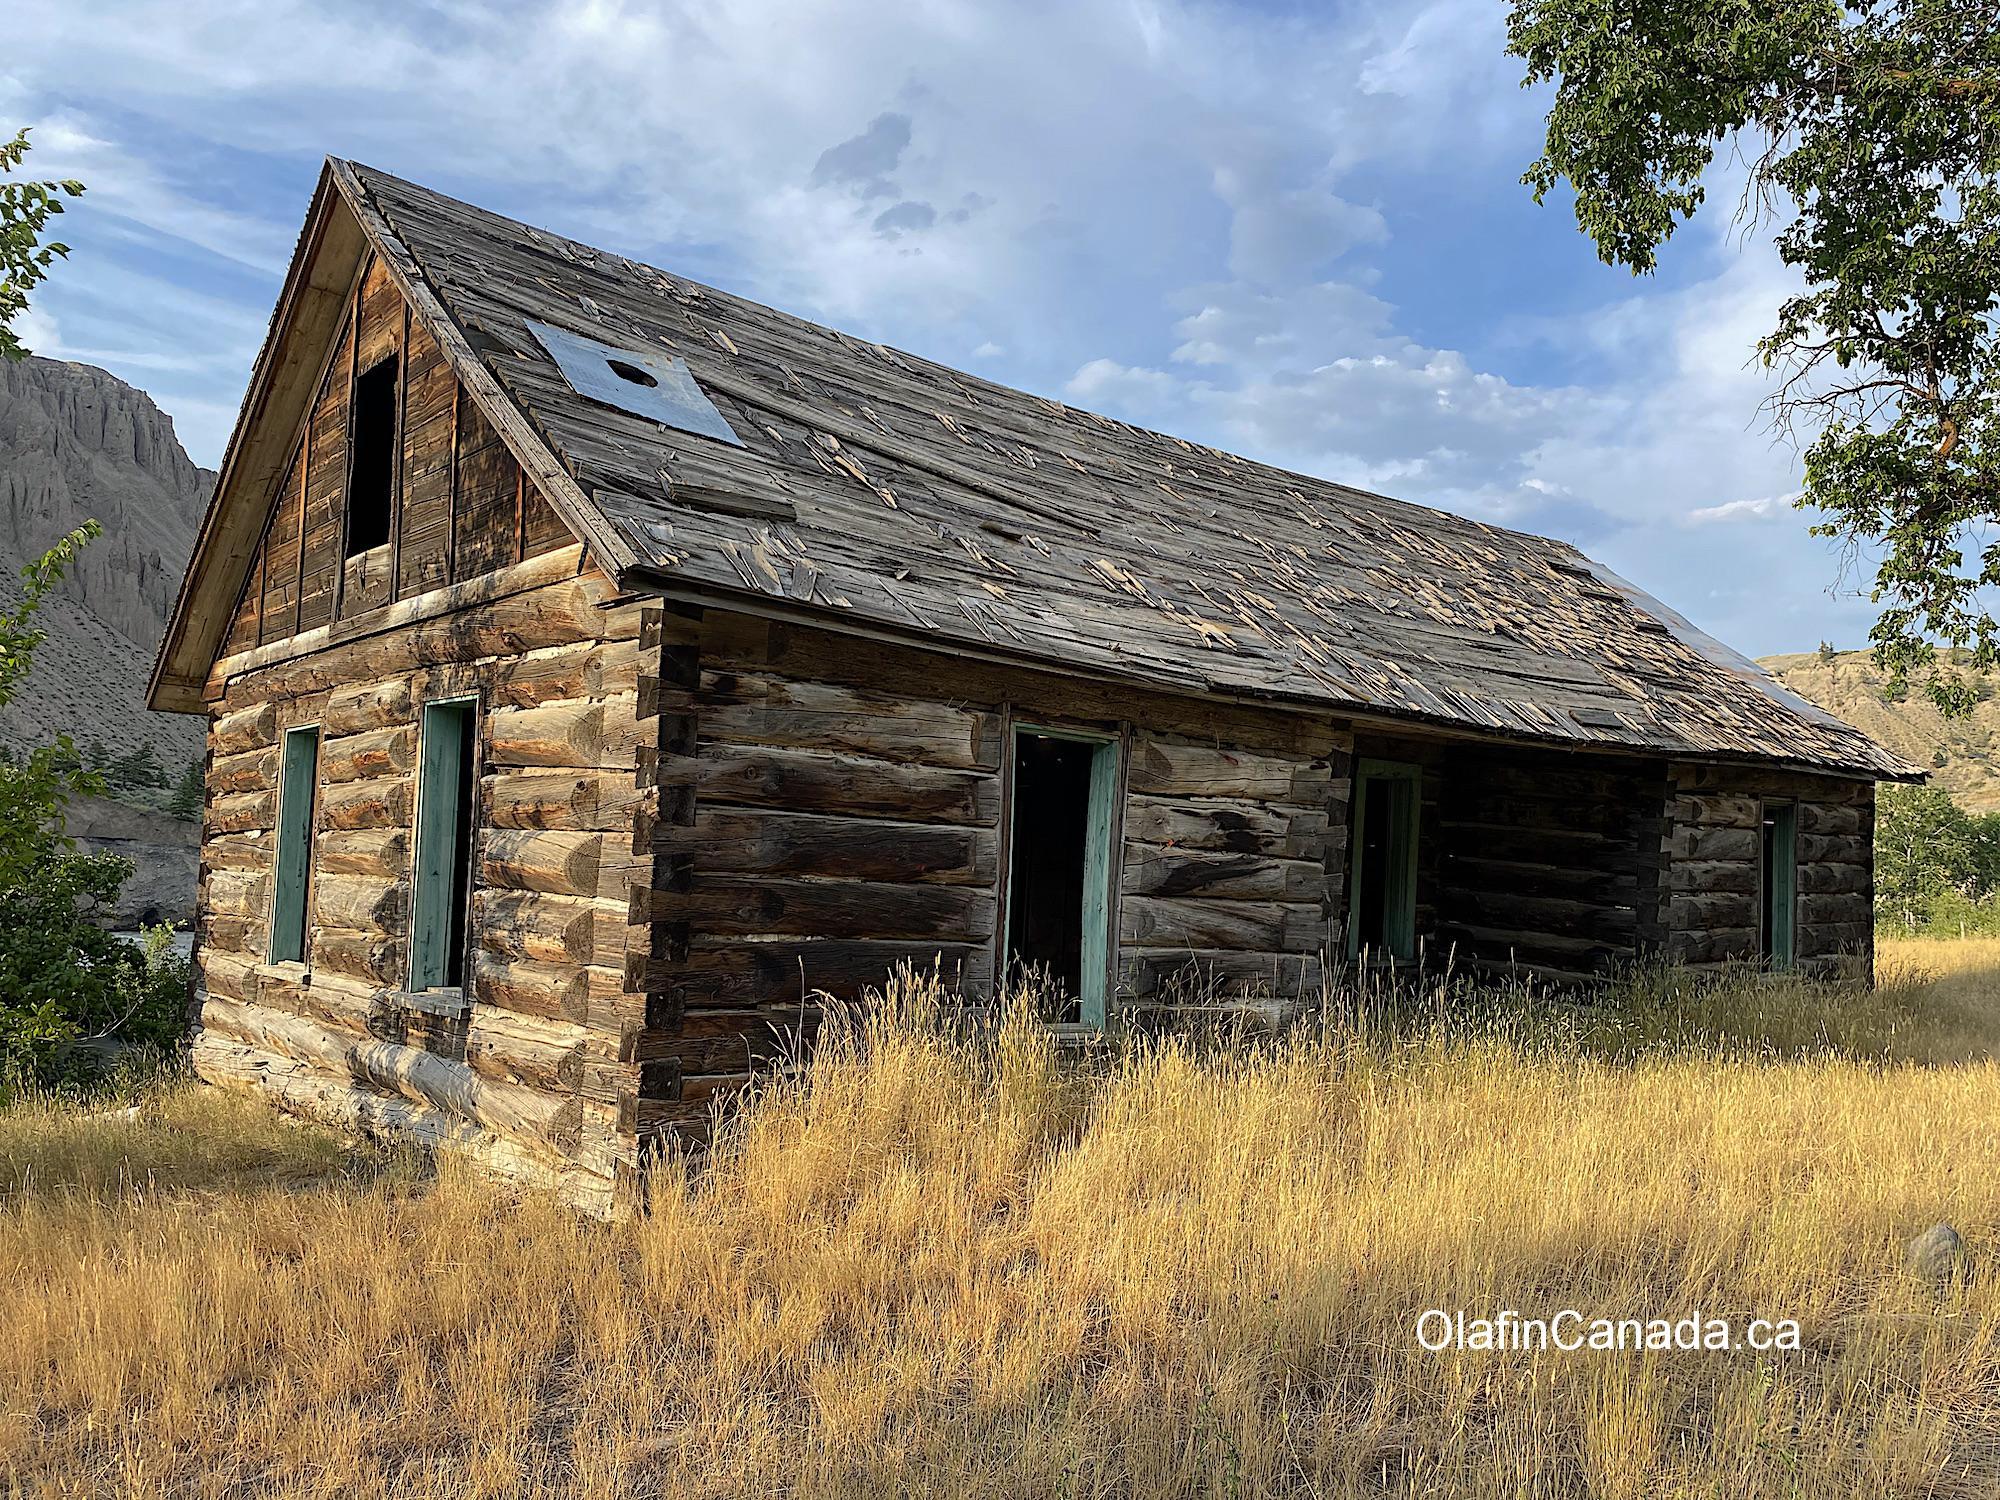 Log home at the Pothole Ranch at sunset #olafincanada #britishcolumbia #discoverbc #abandonedbc #chilcotin #farwellcanyon #potholeranch #homestead